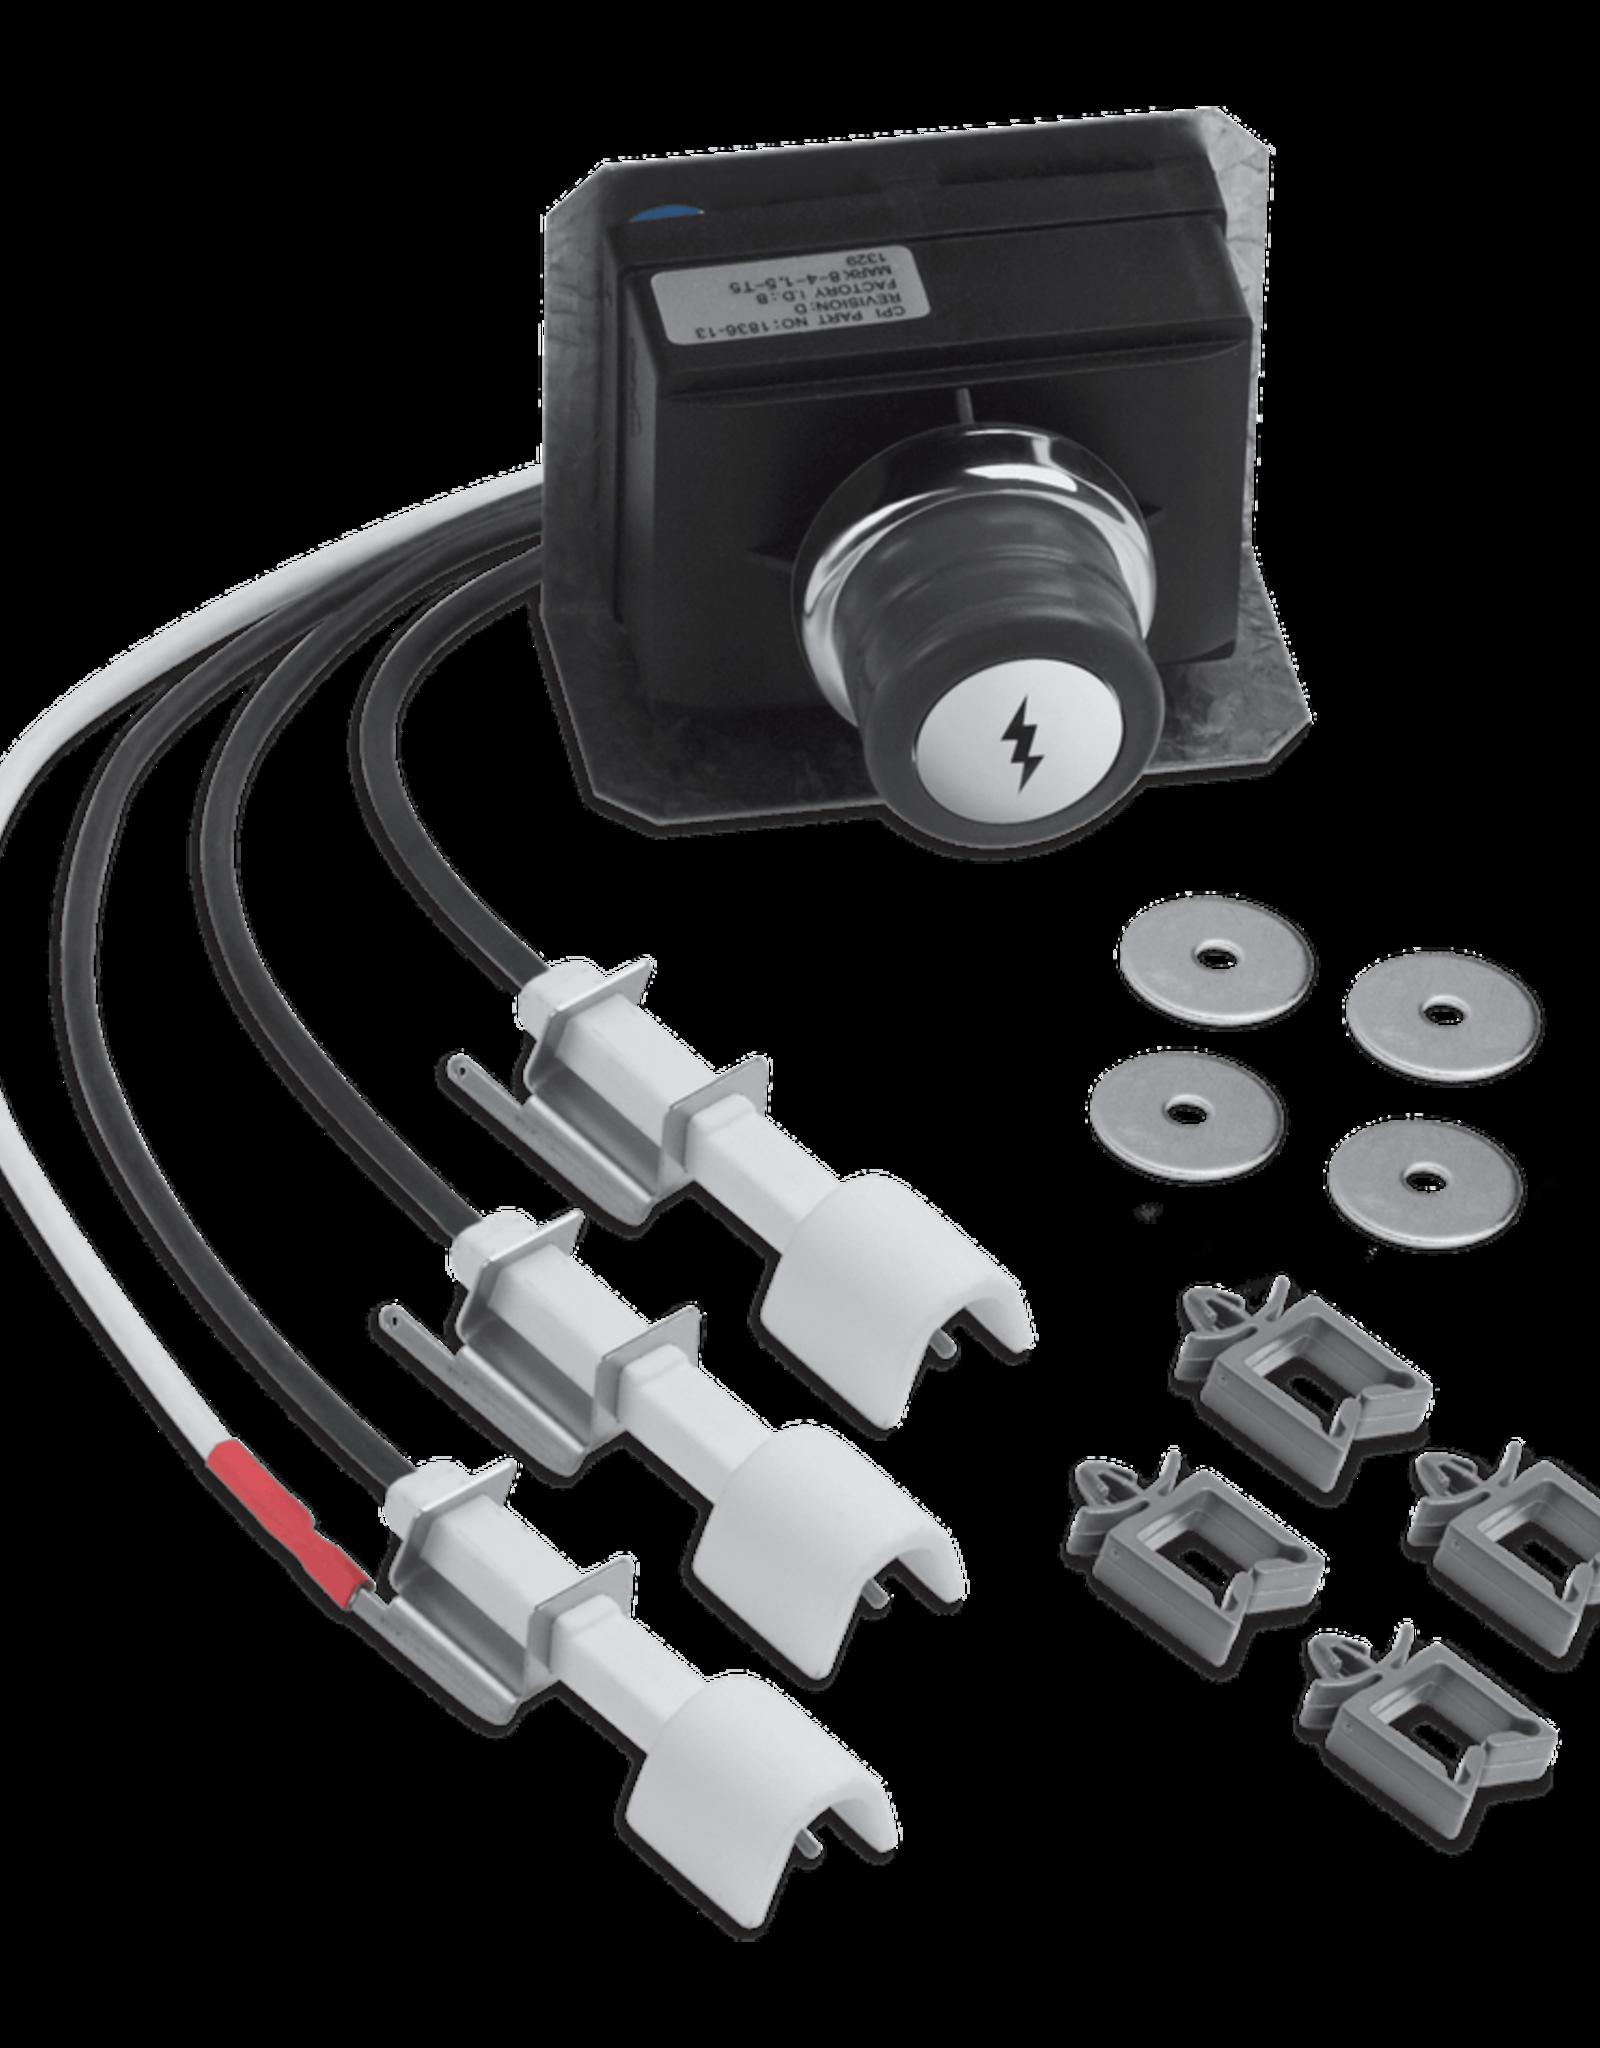 Weber Igniter Kit - Fits Genesis® 310 & 320 (front mount control panel)